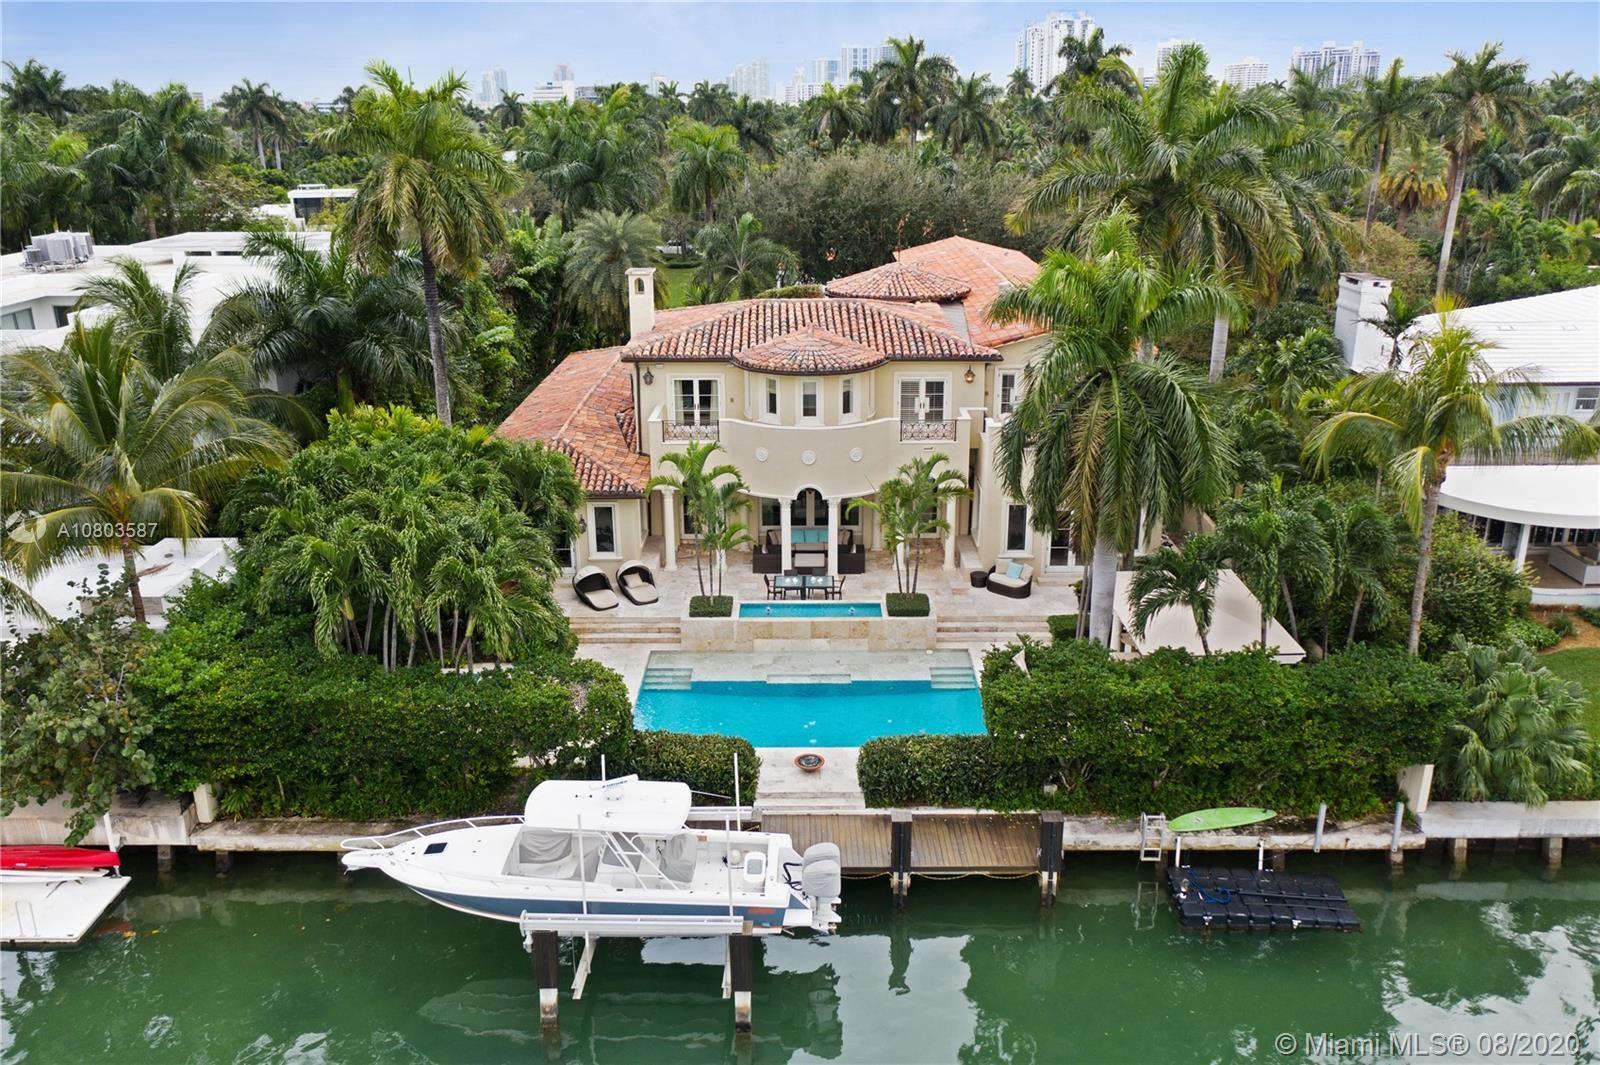 Photo 6 of Listing MLS a10803587 in 1511 W 27th St Miami Beach FL 33140